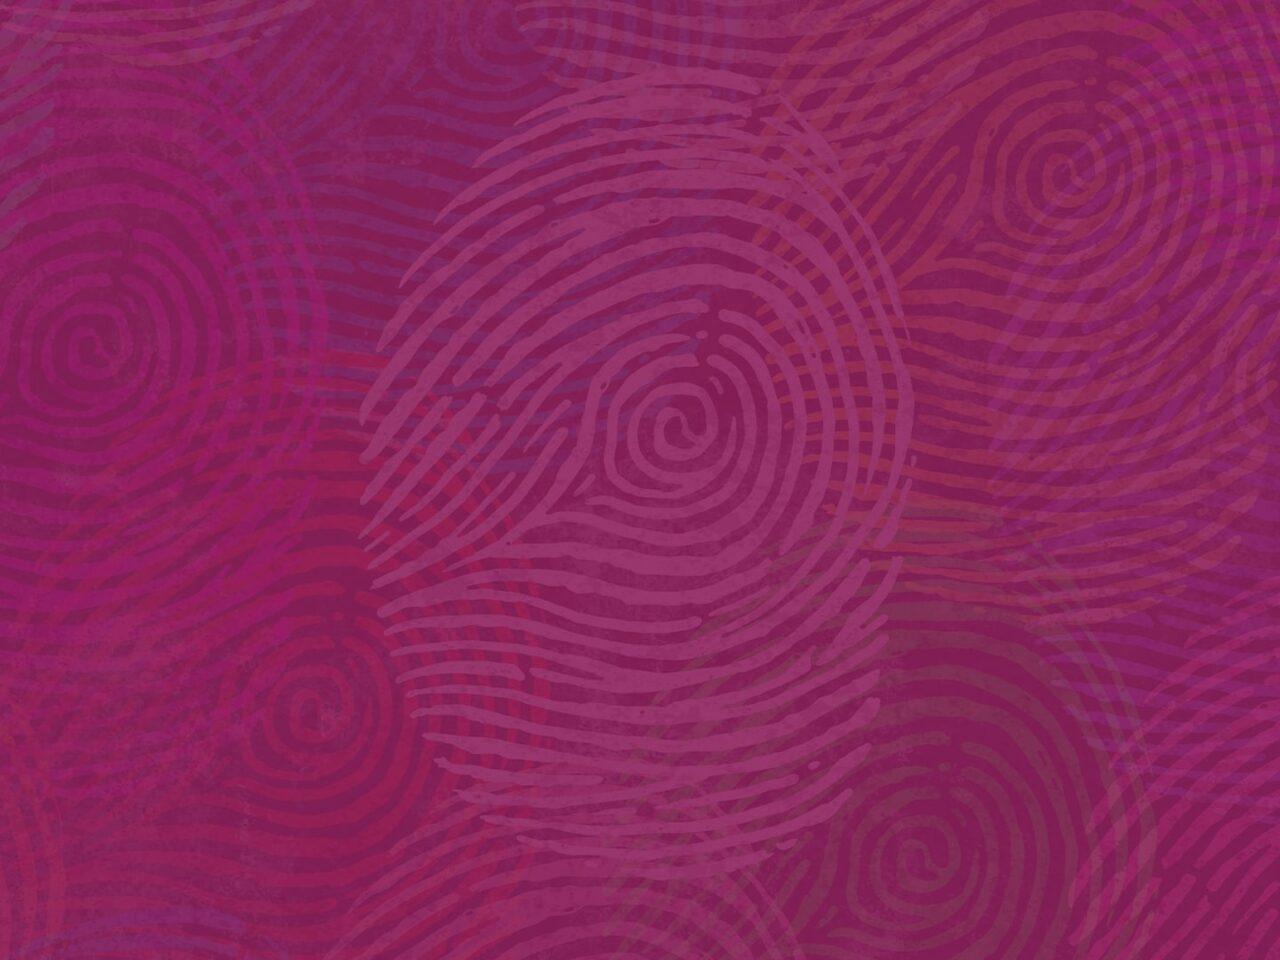 http://www.nbct.org.uk/wp-content/uploads/2021/06/maroon_finger_prints_1920-min-1280x960.jpg